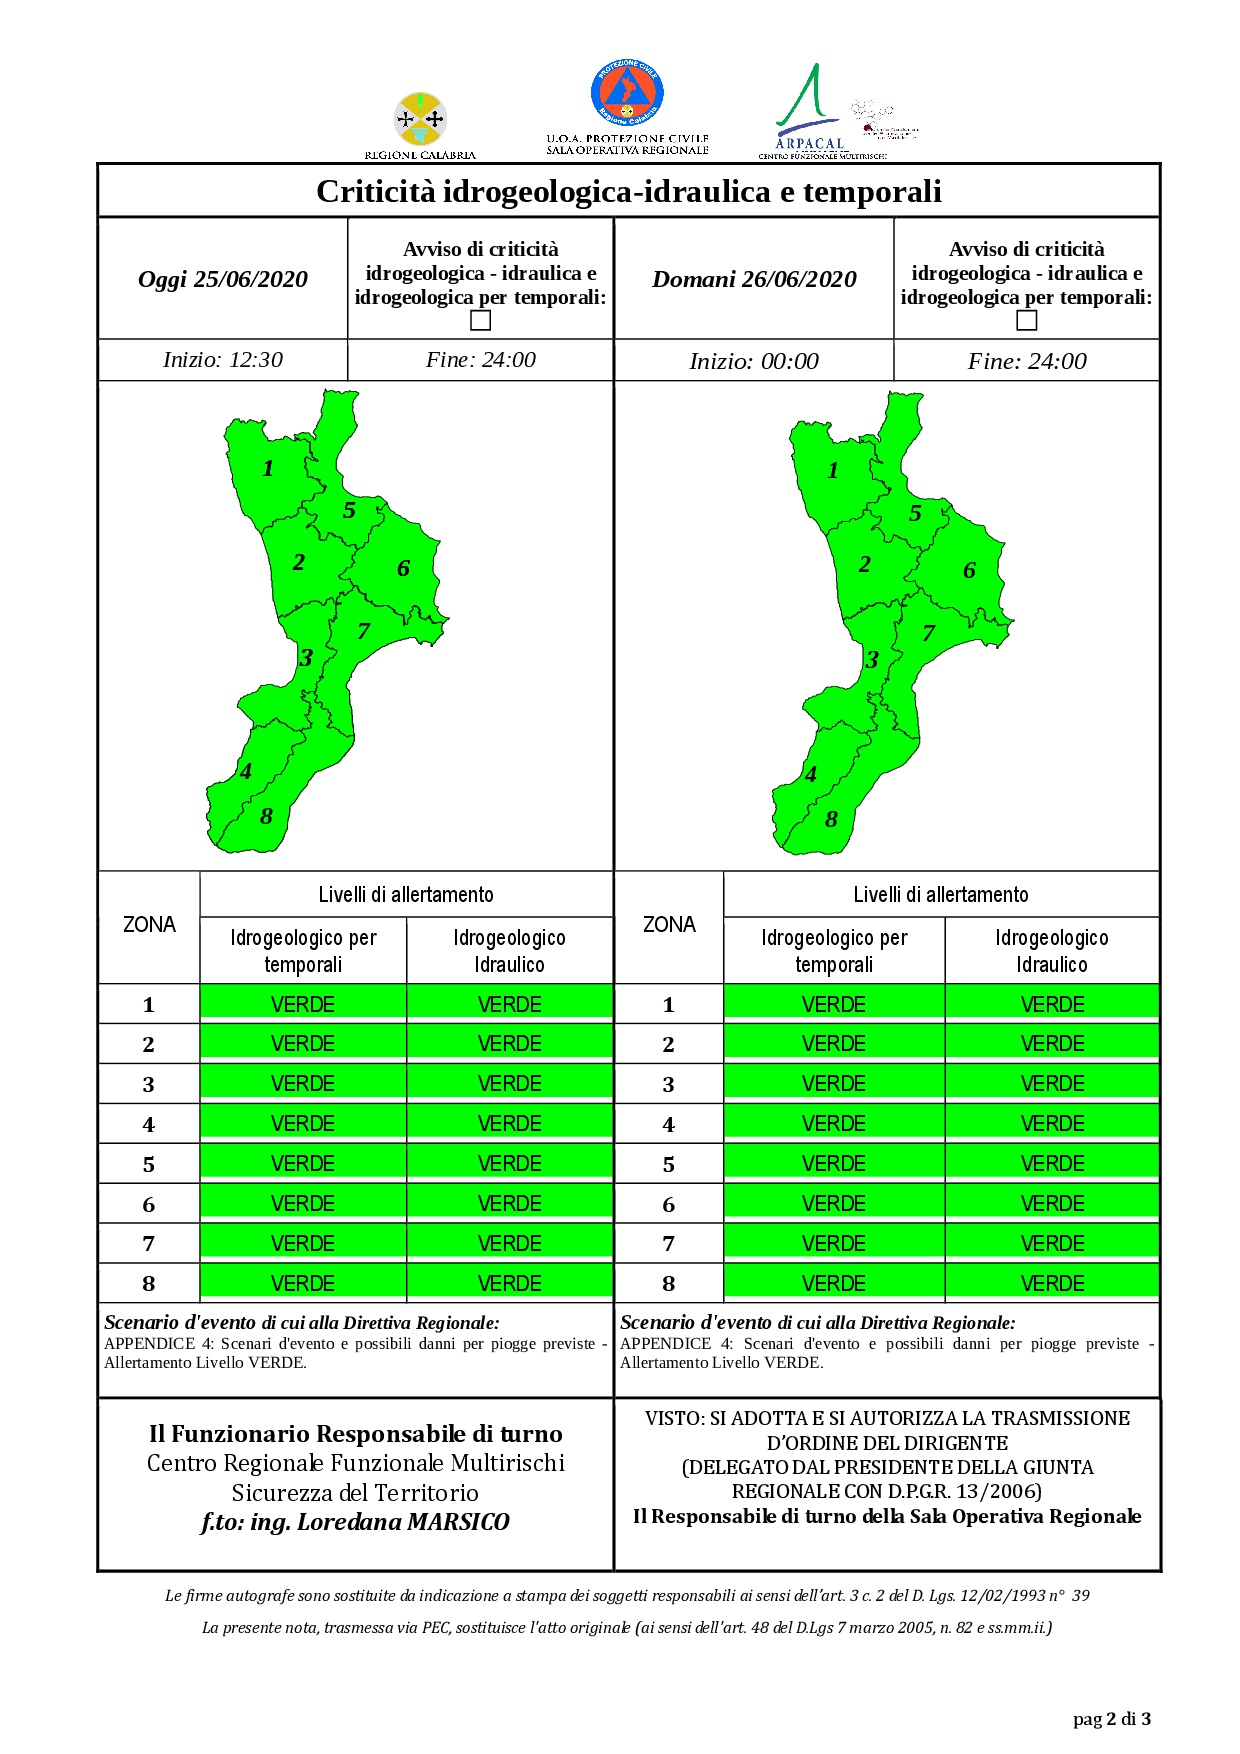 Criticità idrogeologica-idraulica e temporali in Calabria 25-06-2020